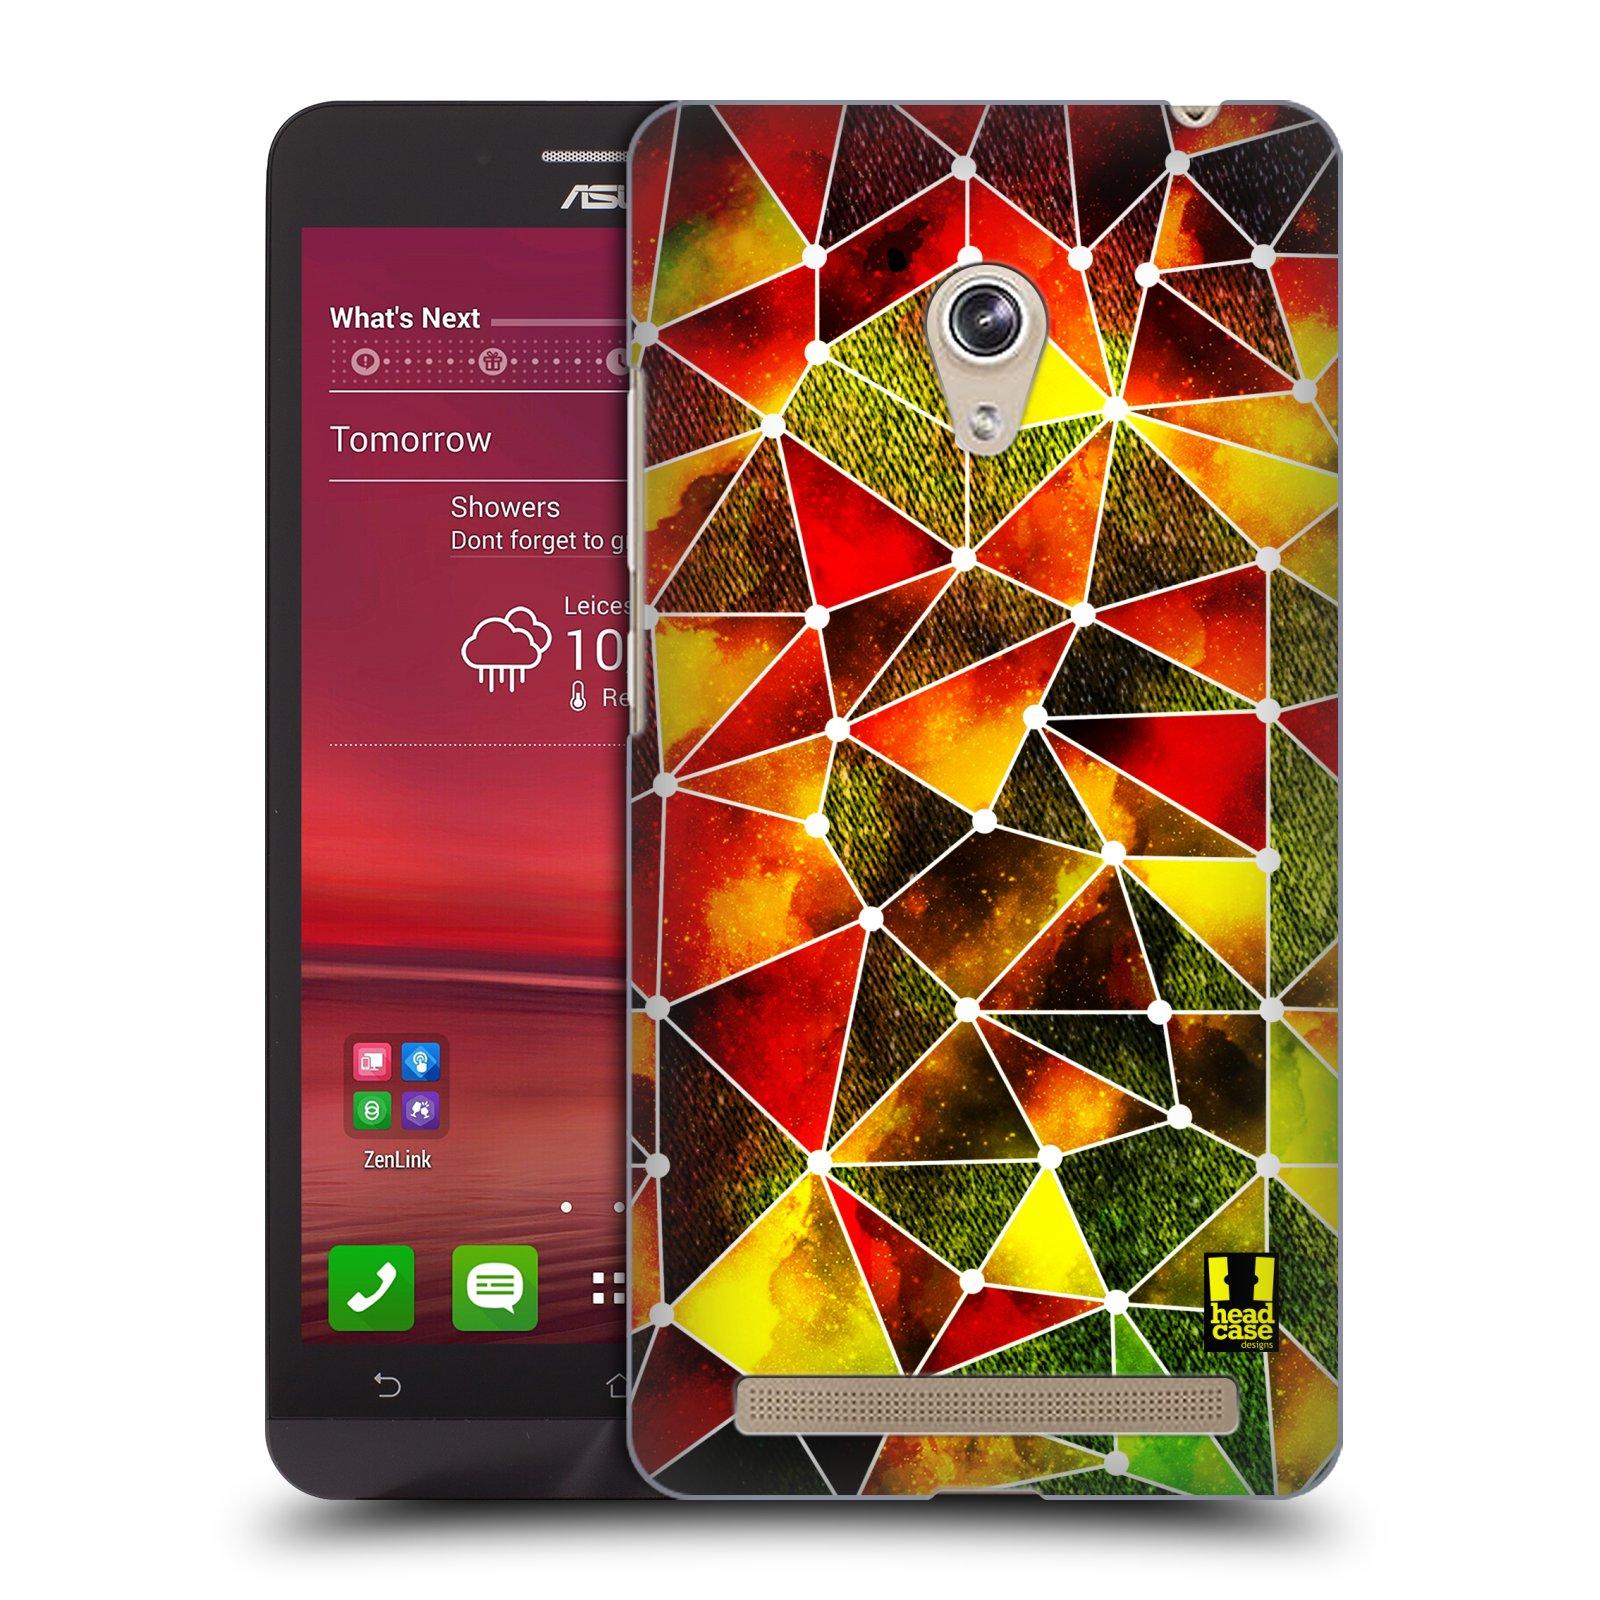 Plastové pouzdro na mobil Asus Zenfone 6 HEAD CASE PATTERN GEOMETRIC RASTA (Kryt či obal na mobilní telefon Asus Zenfone 6 A600CG / A601CG)